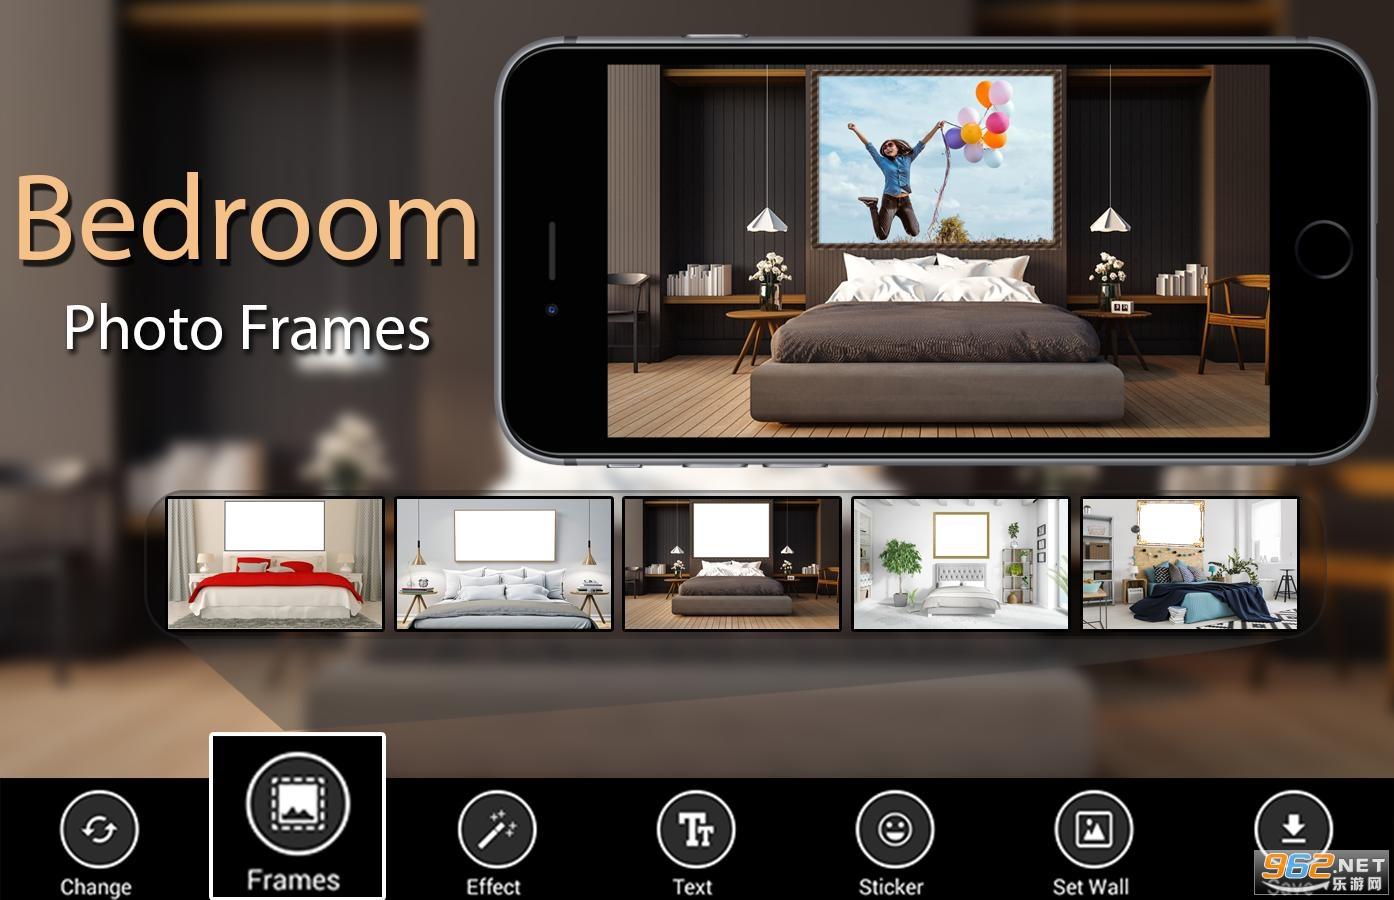 Bedroom Photo Frames卧室相框v14.0 最新版截图0